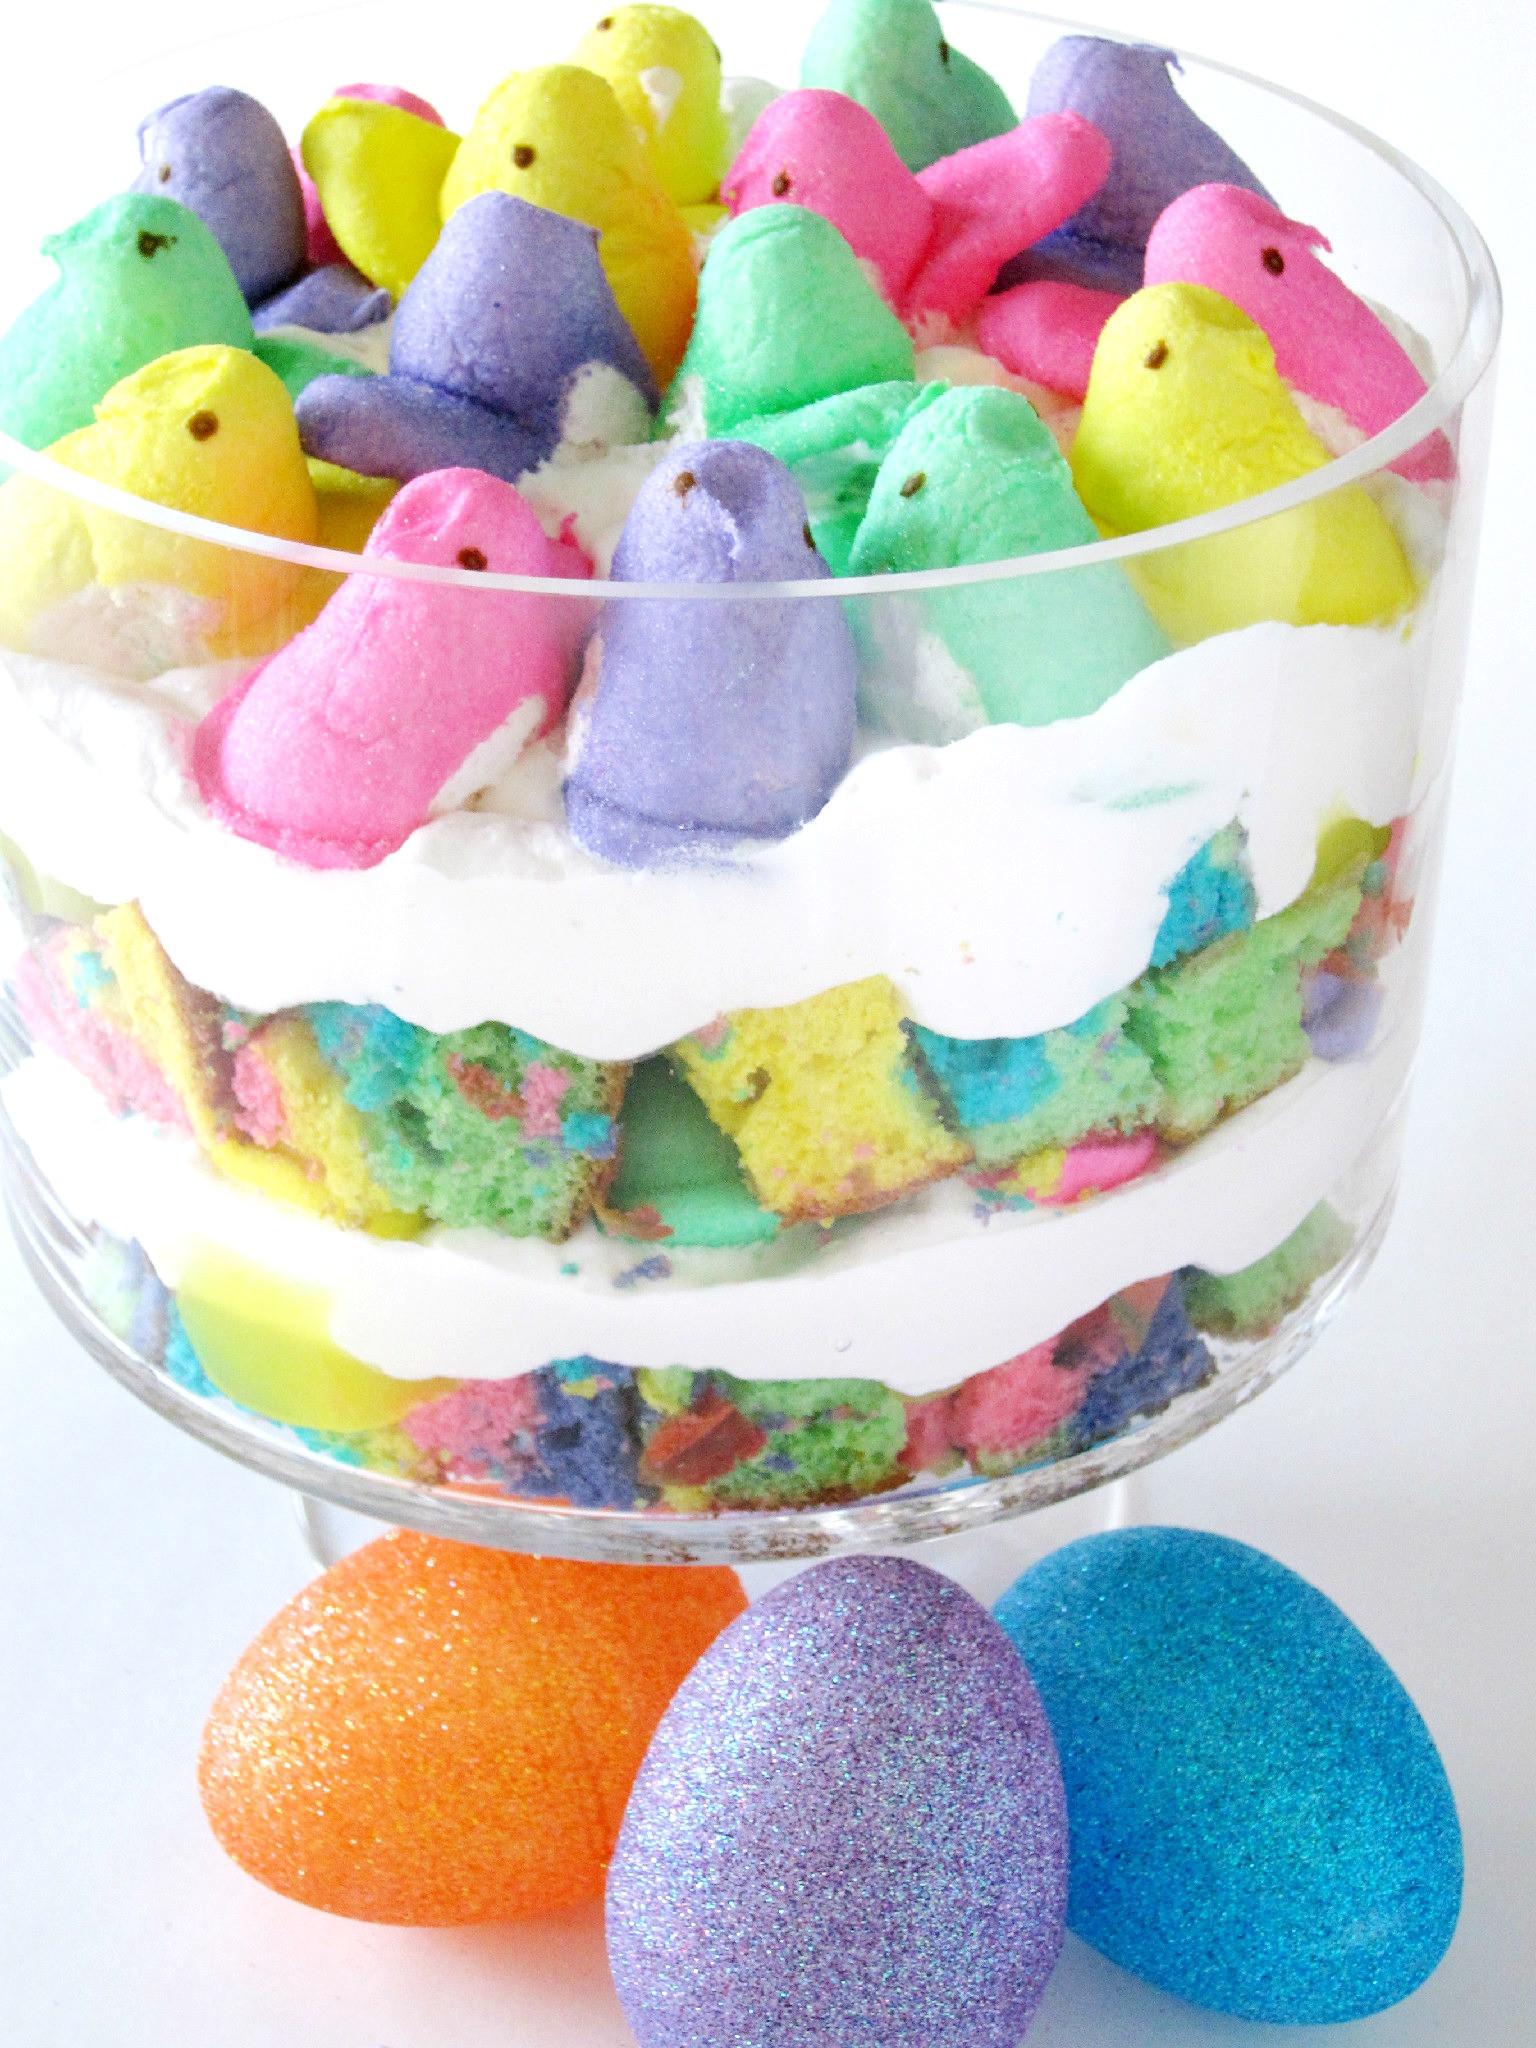 Easter Dessert Recipes  Easter Dessert Recipes